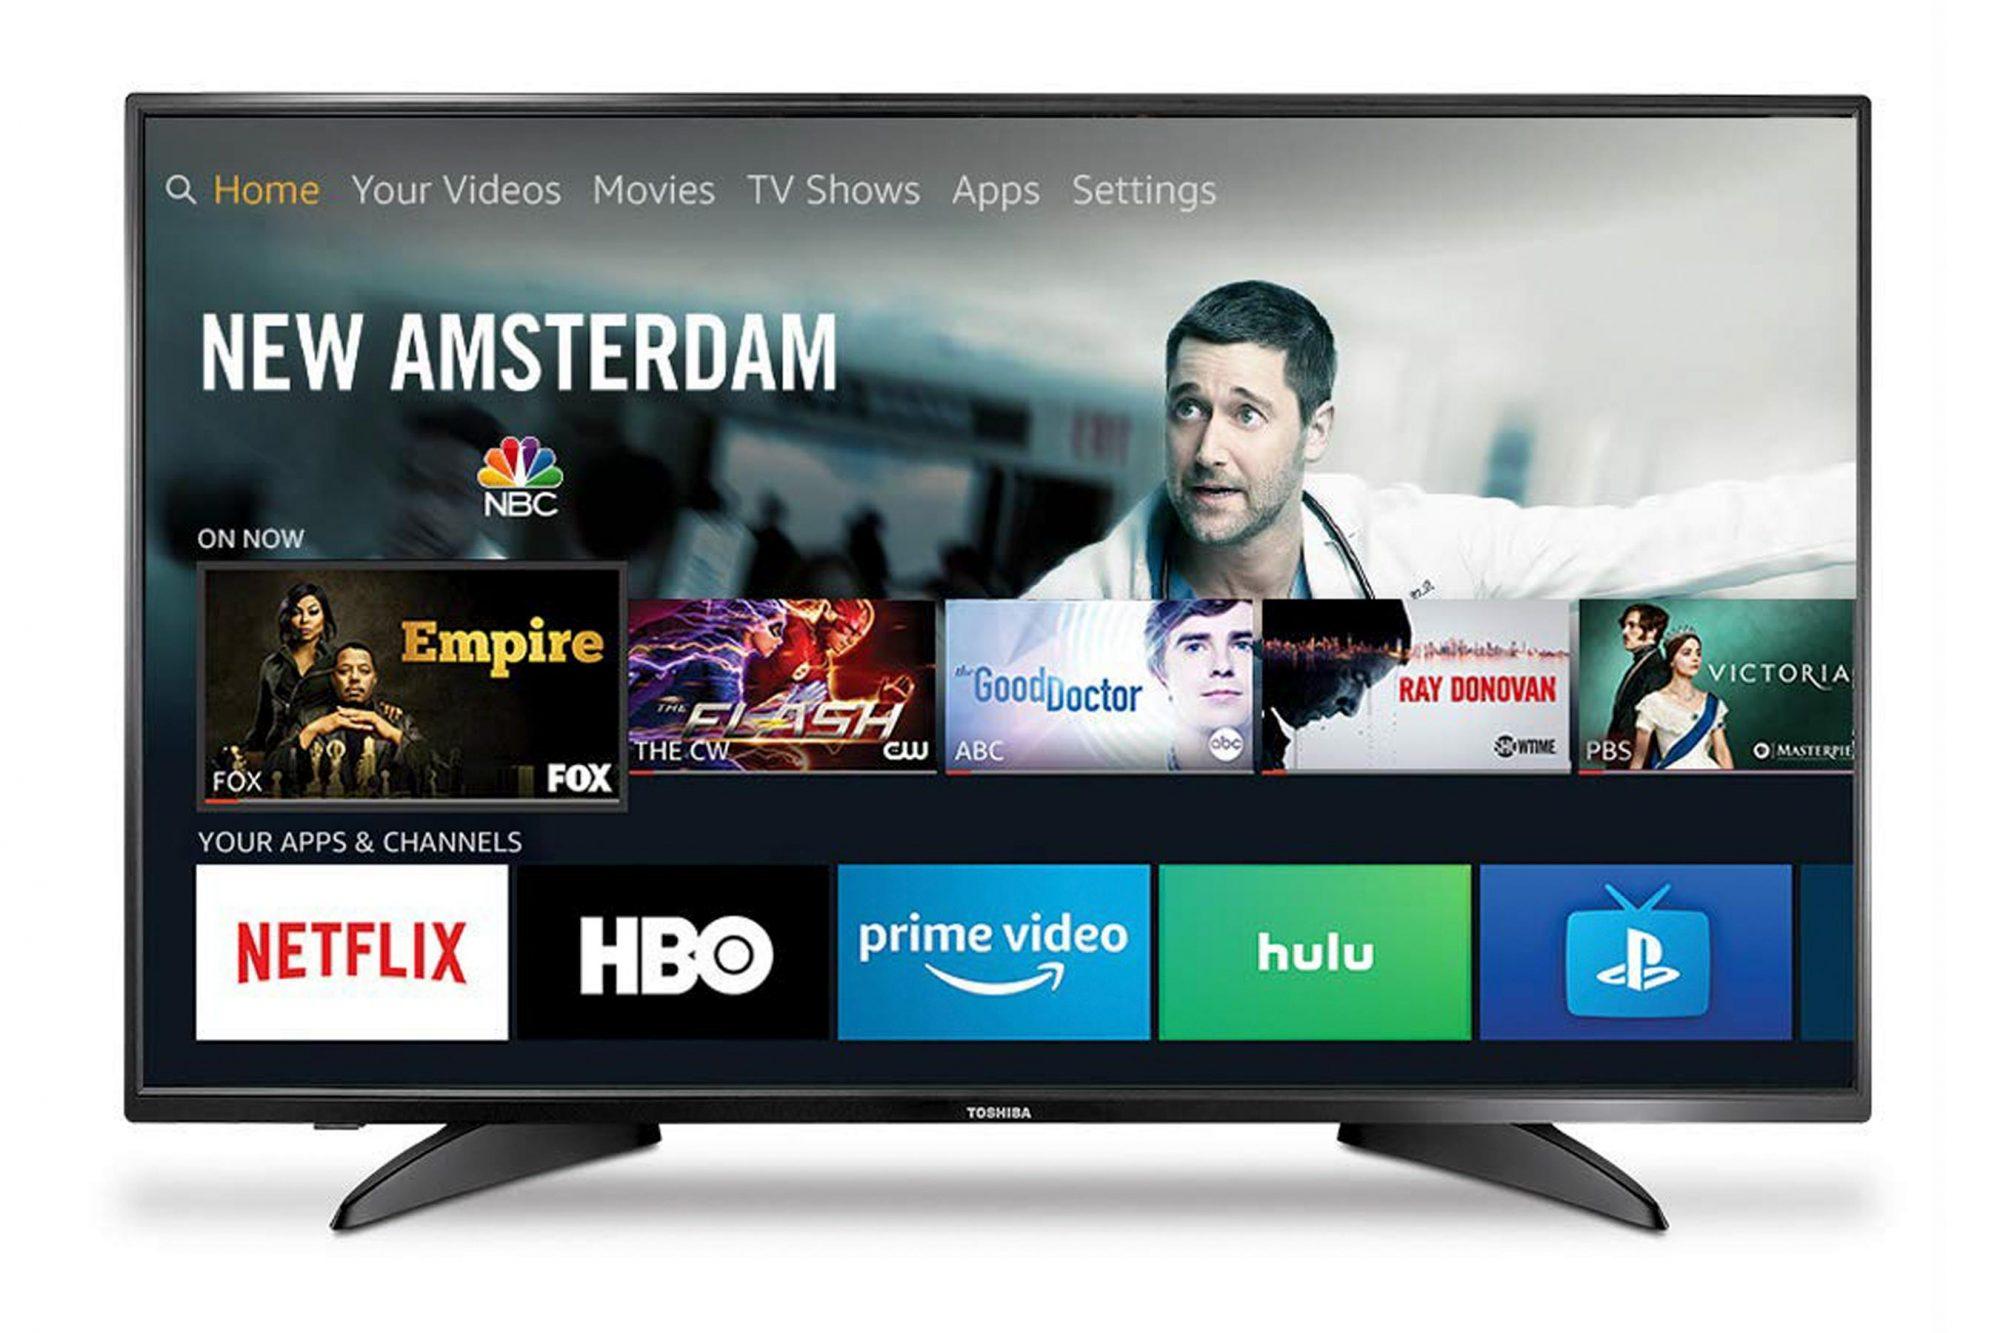 Toshiba 43LF421U19 43-inch 1080p Full HD Smart LED TV - Fire TV Edition CR: Amazon Prime Day 2019